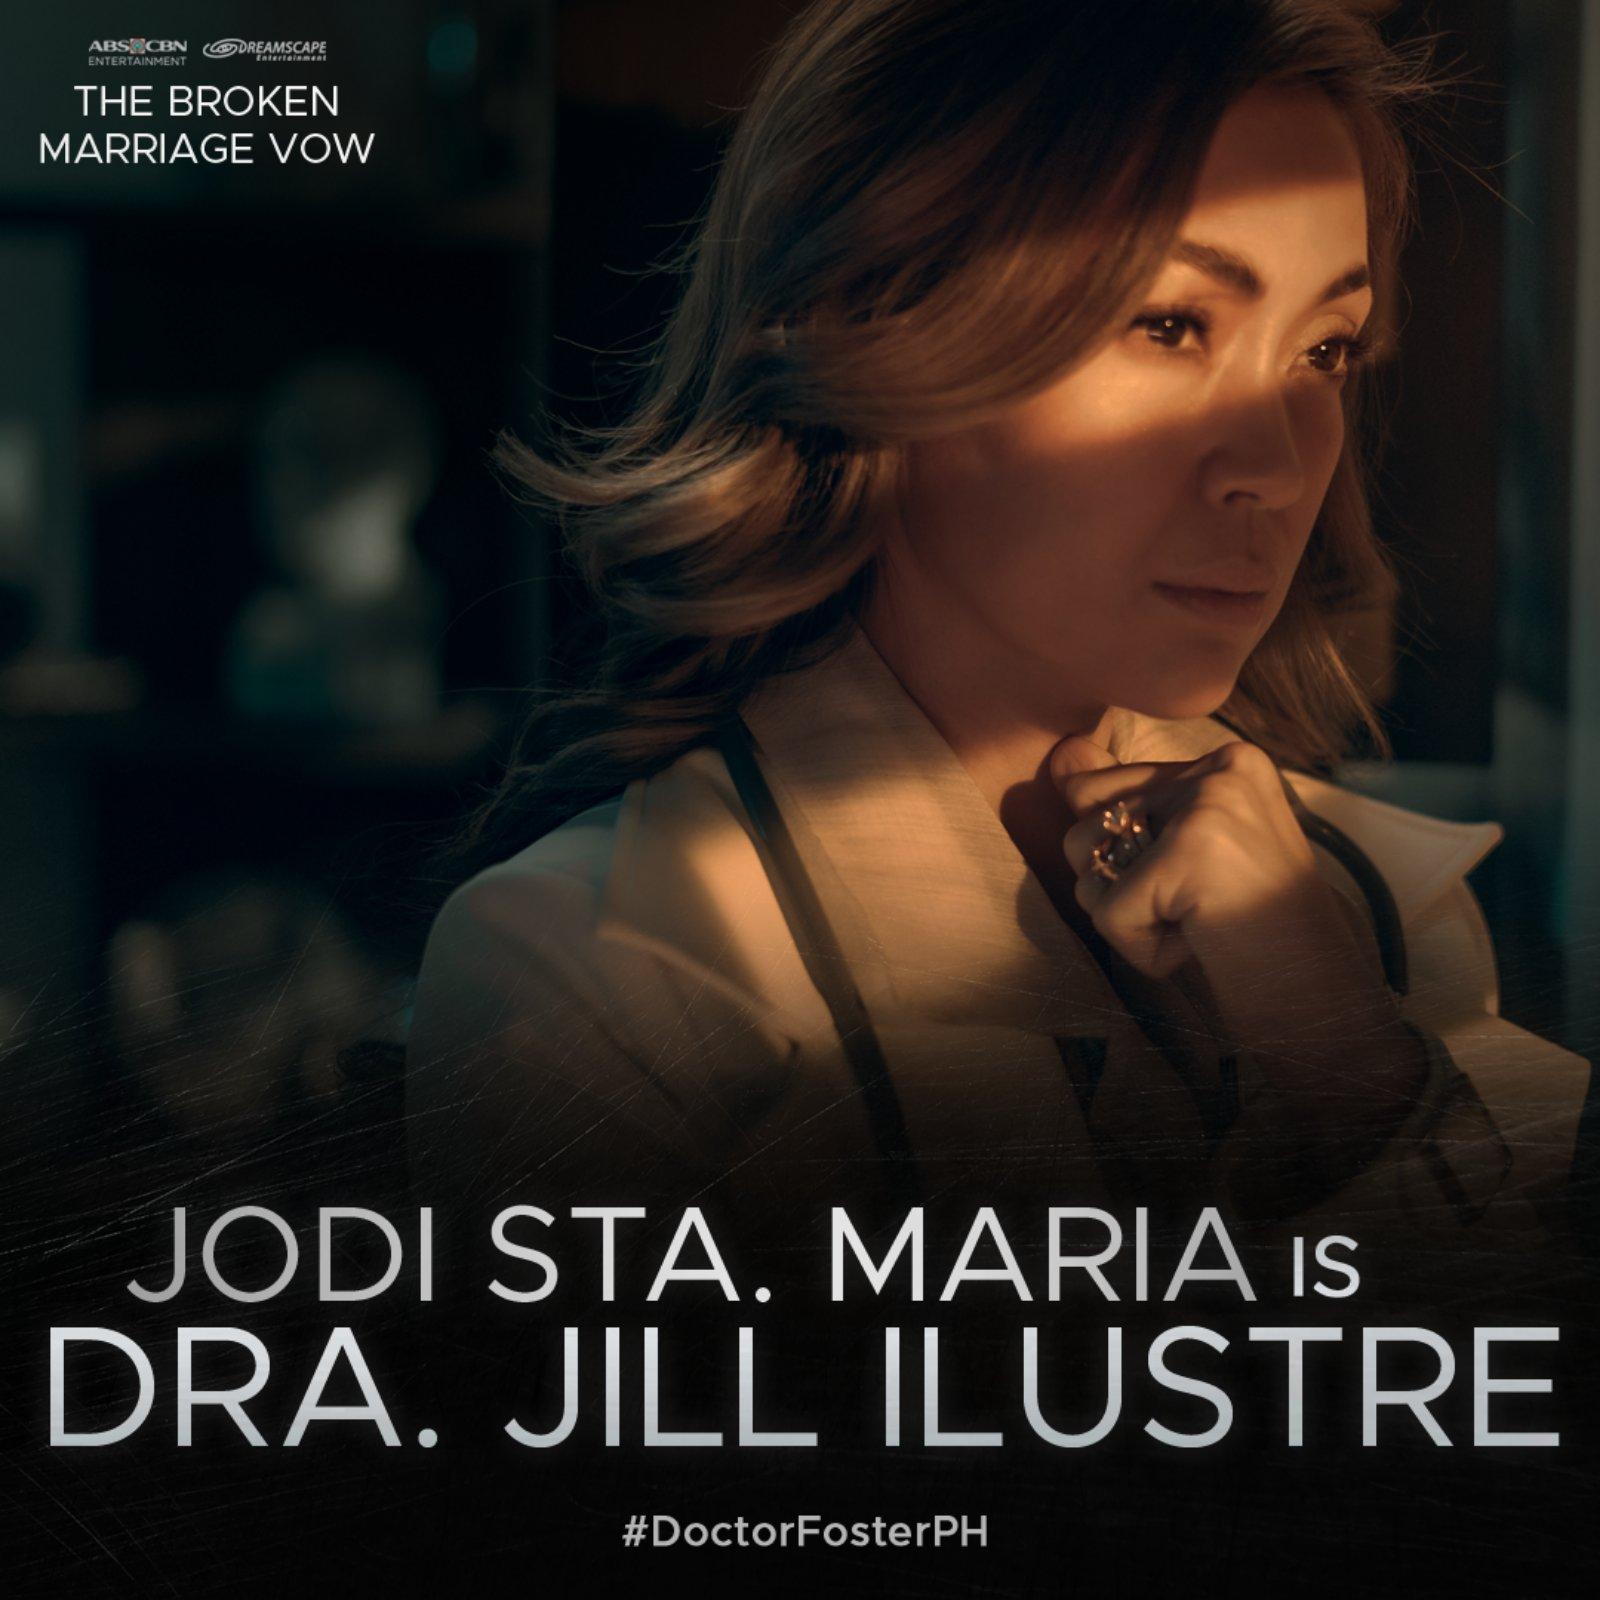 Jodi Sta  Maria is Dra  Jill Ilustre in The Broken Marriage Vow